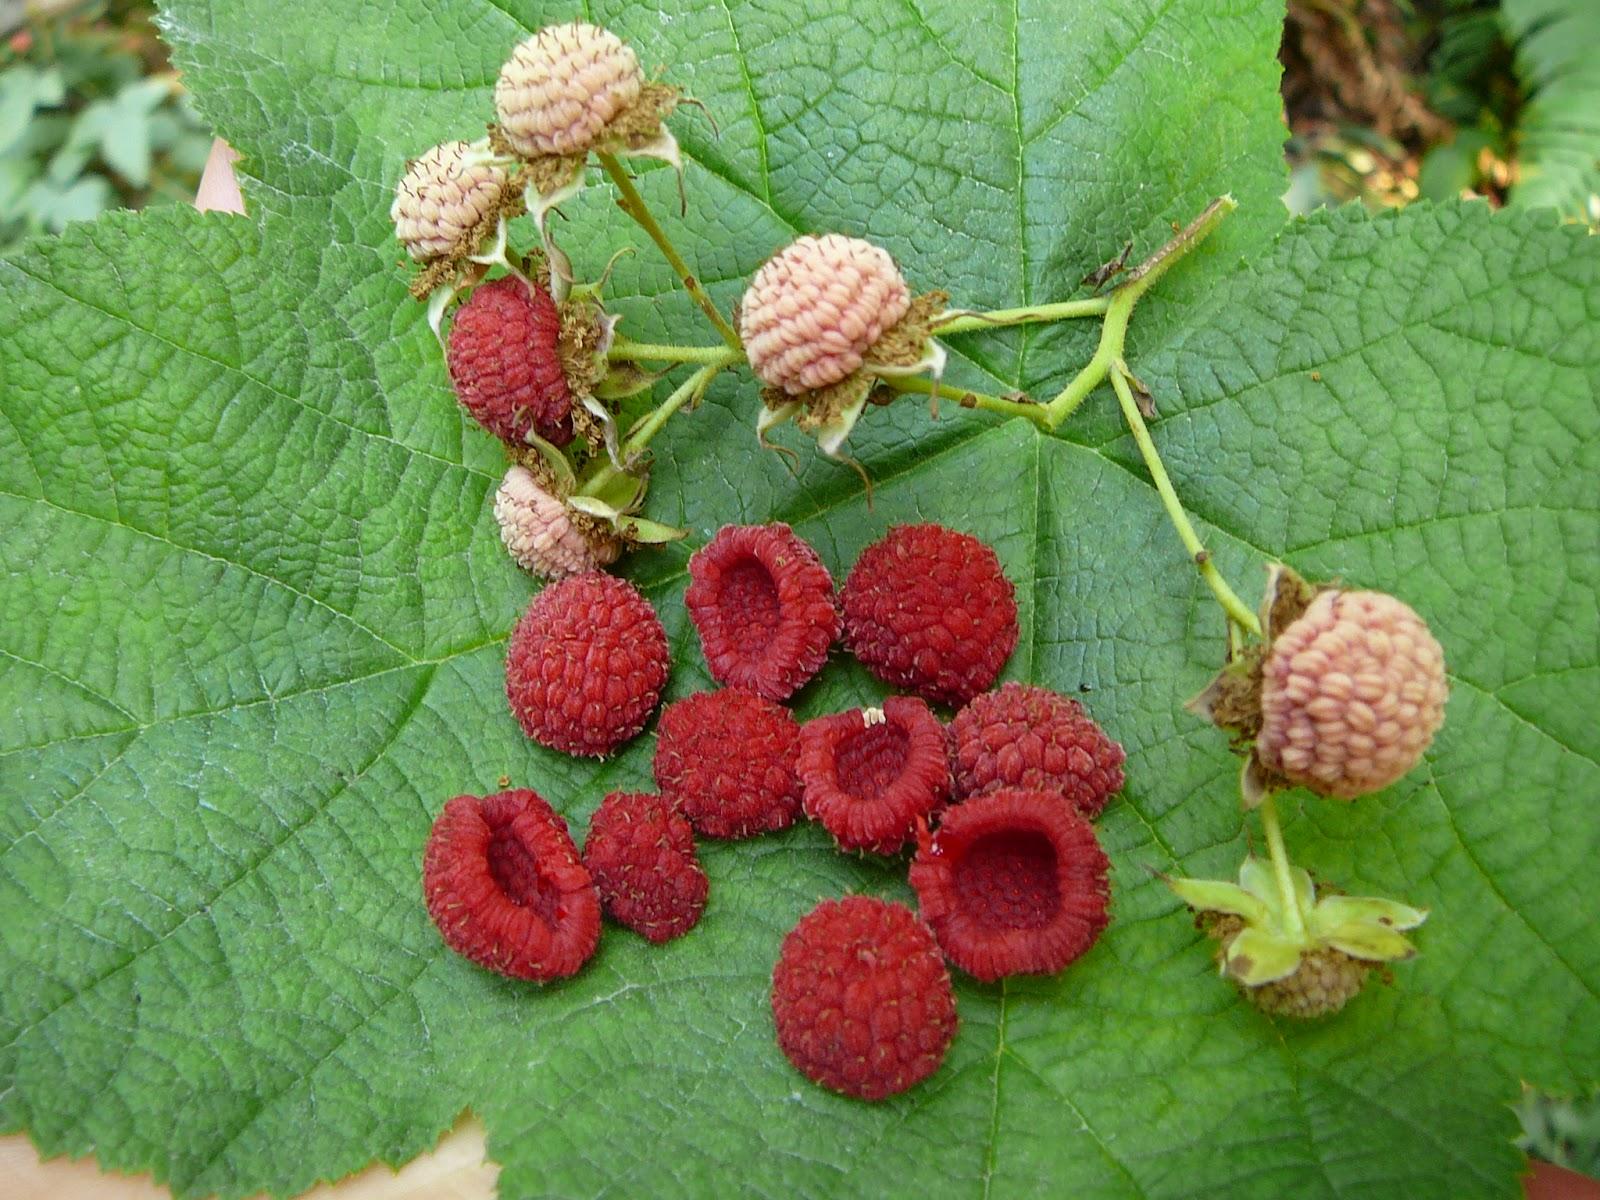 Raspberry Bush Images